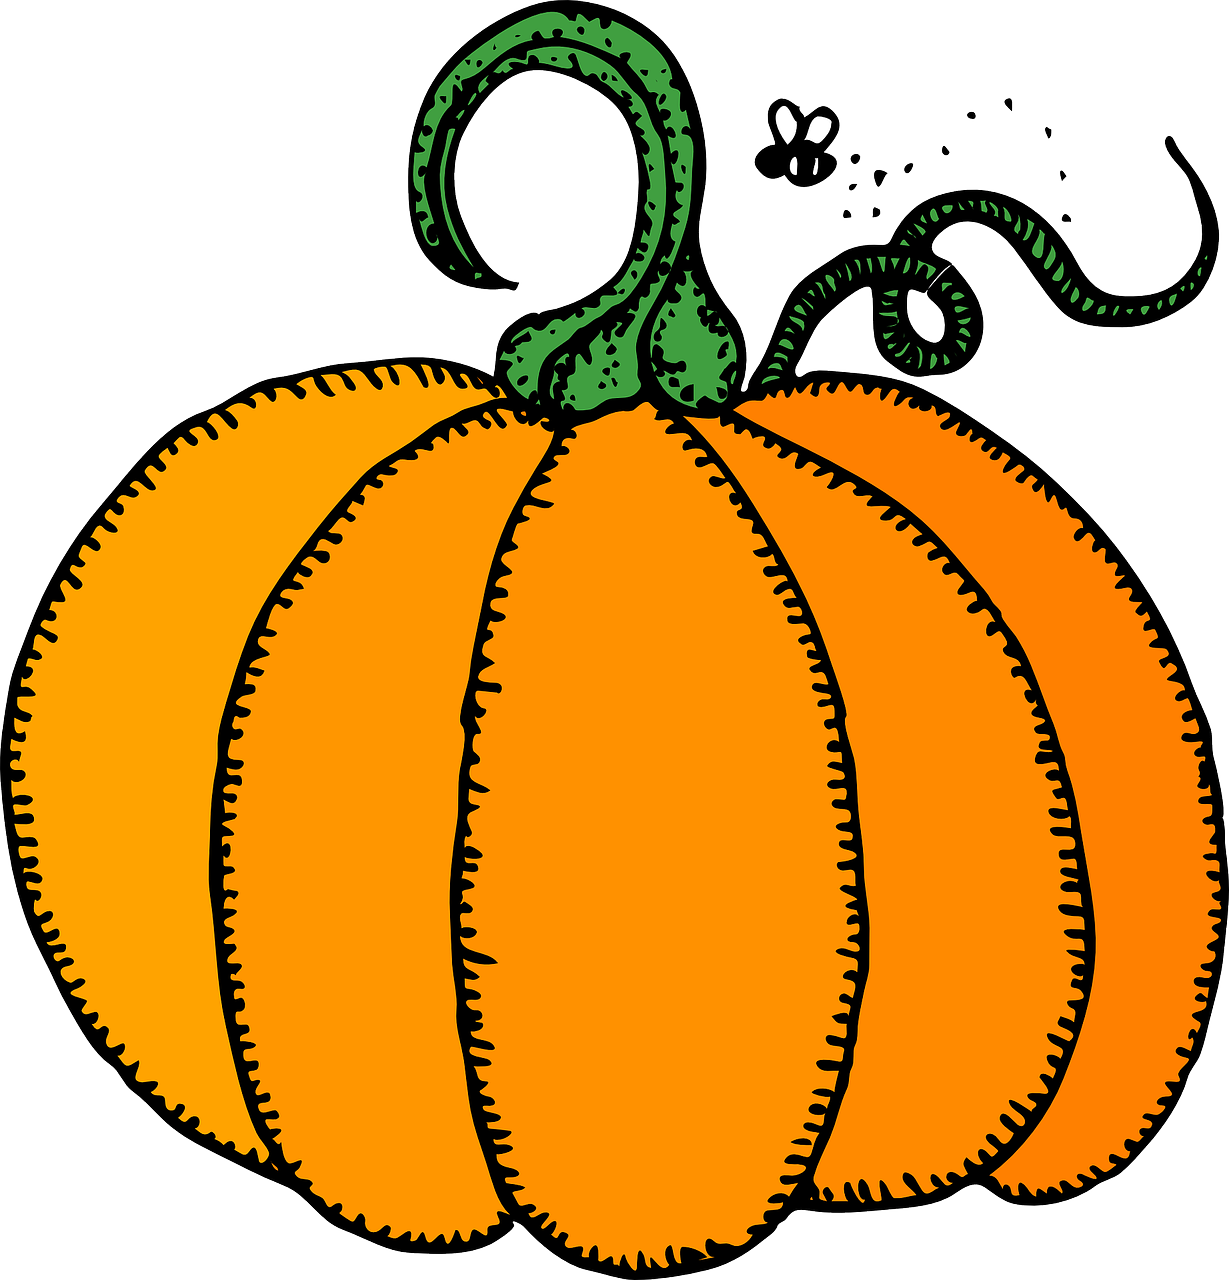 Pumpkin squash fruits thanksgiving. Meal clipart winter season food